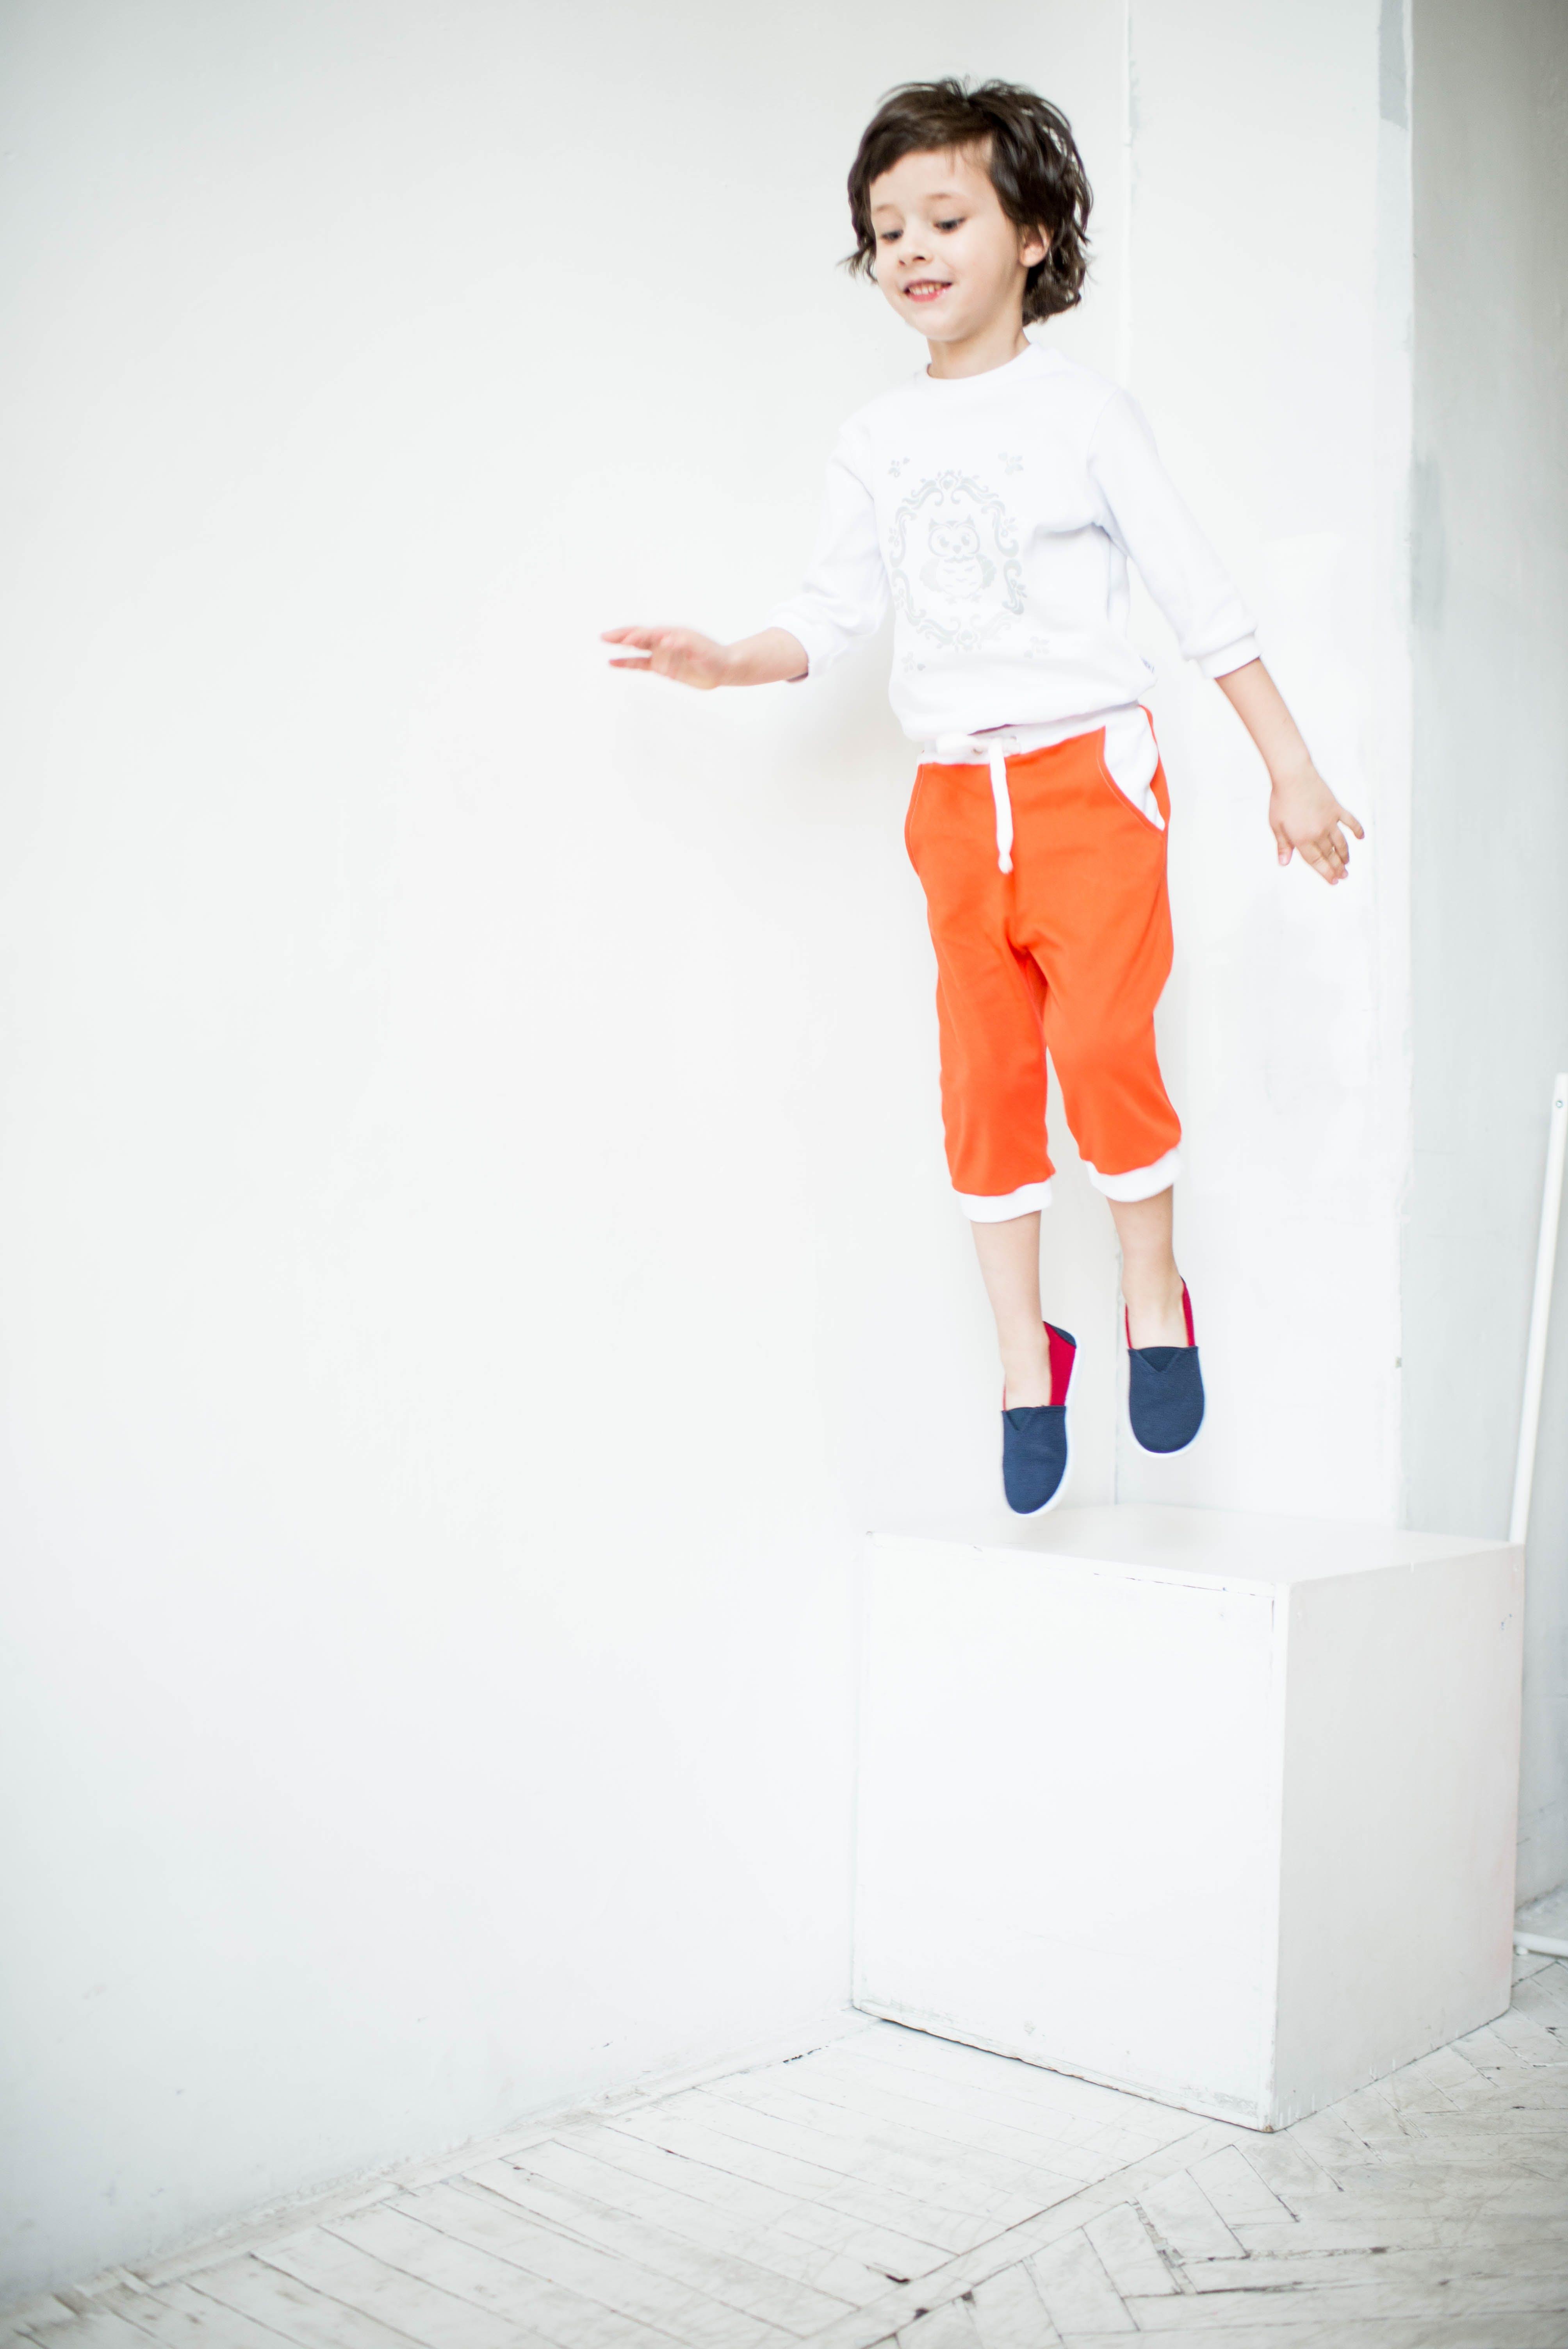 Boy Jumping Near Wall